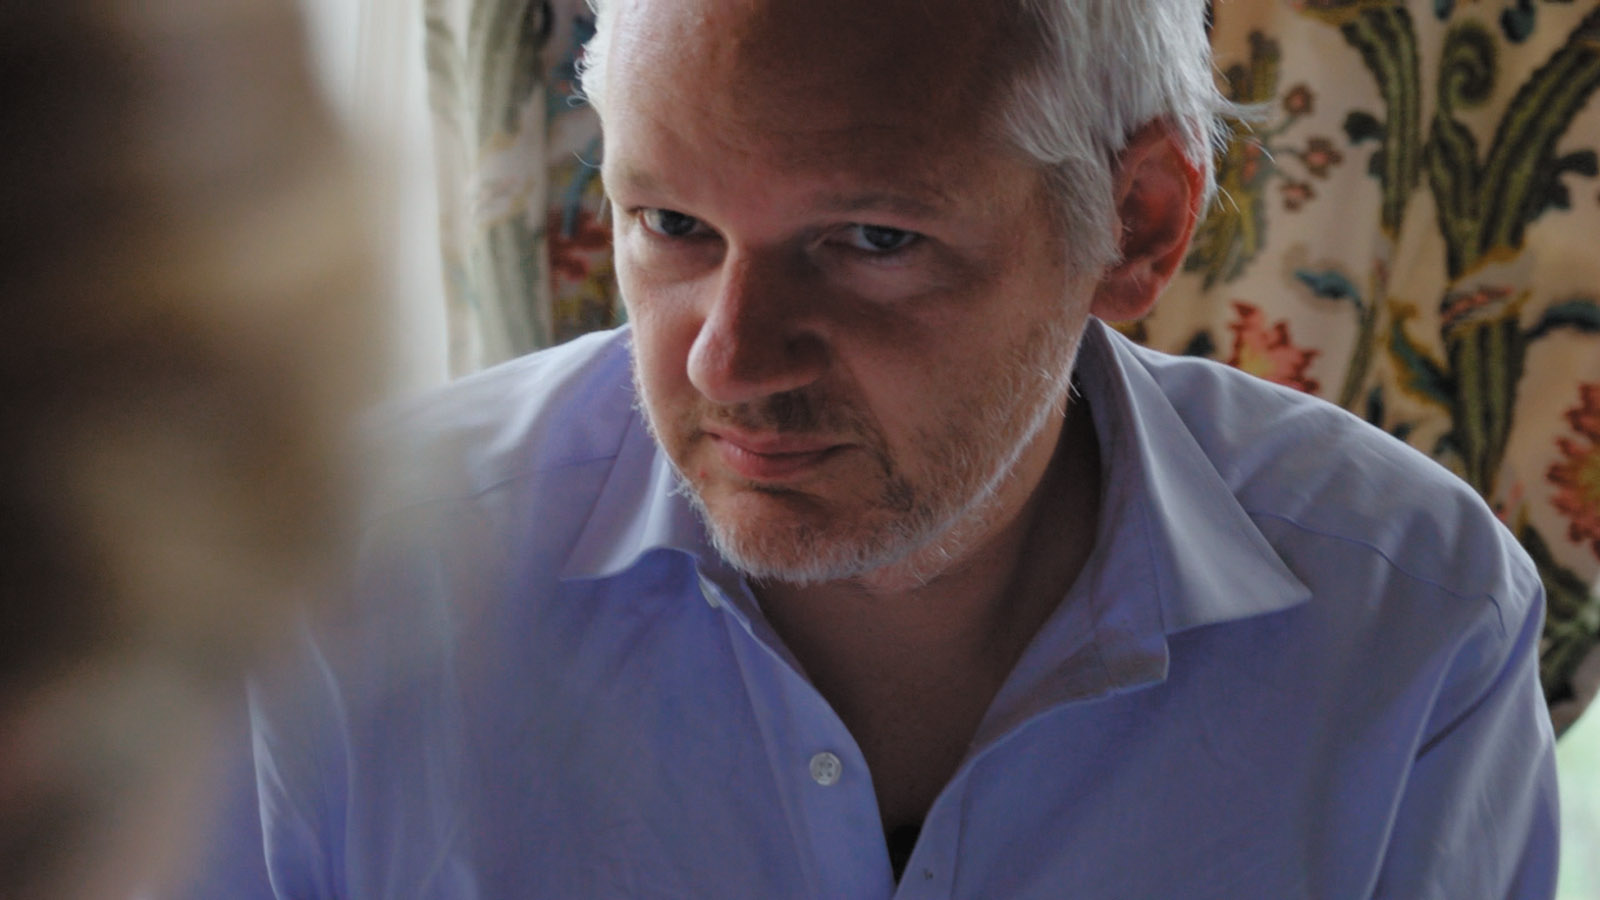 WikiLeaks founder Julian Assange in Laura Poitras's documentary film Risk